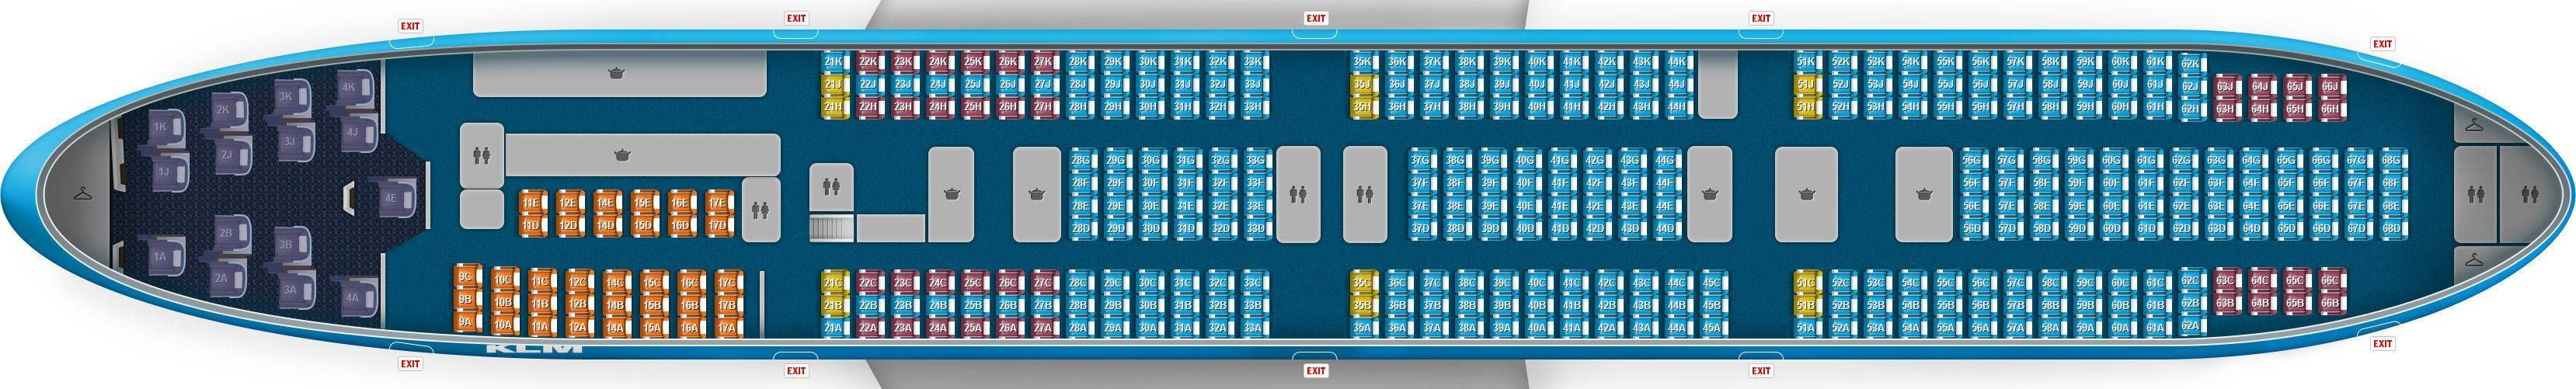 747 flat bed_tcm638-481284